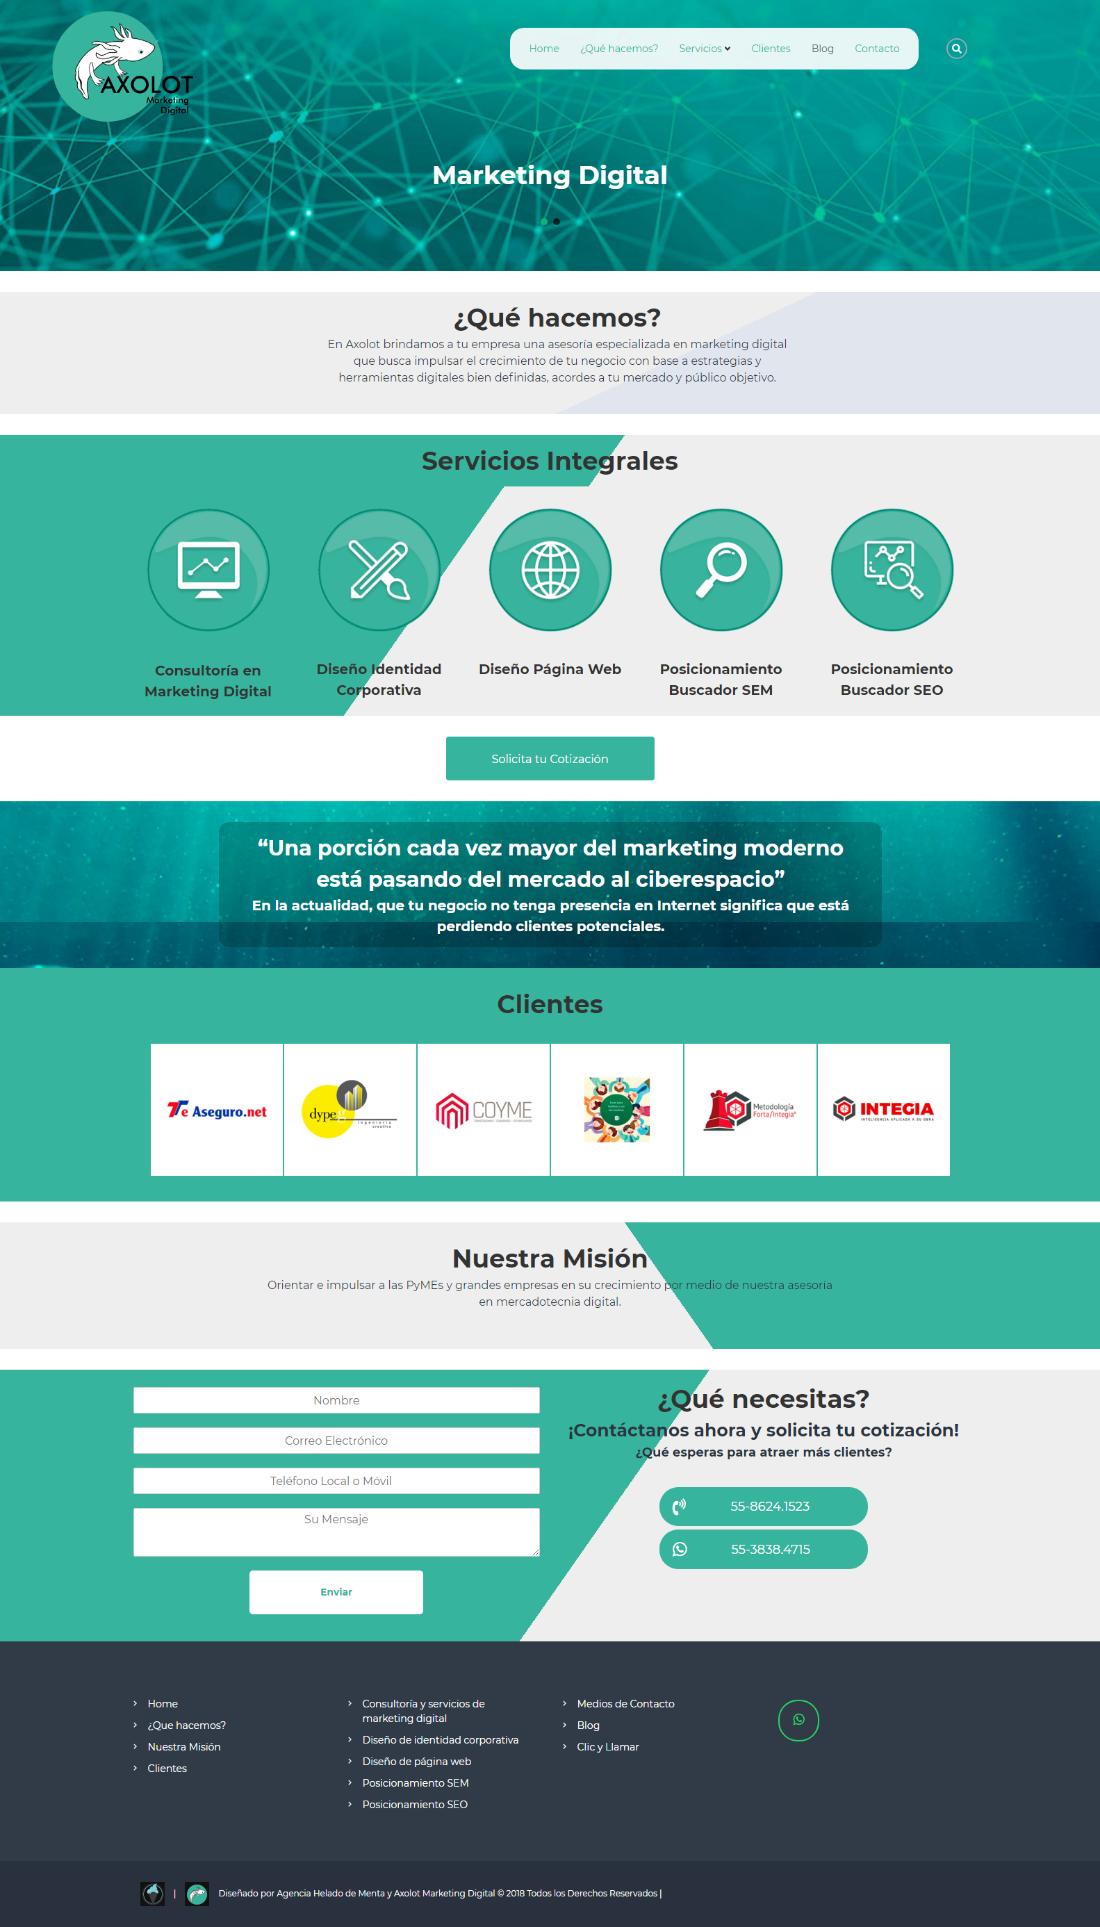 Diseno De Pagina Web Responsive Con Crm Diseno De Pagina Diseno Web Minimalista Diseno De Paginas Web